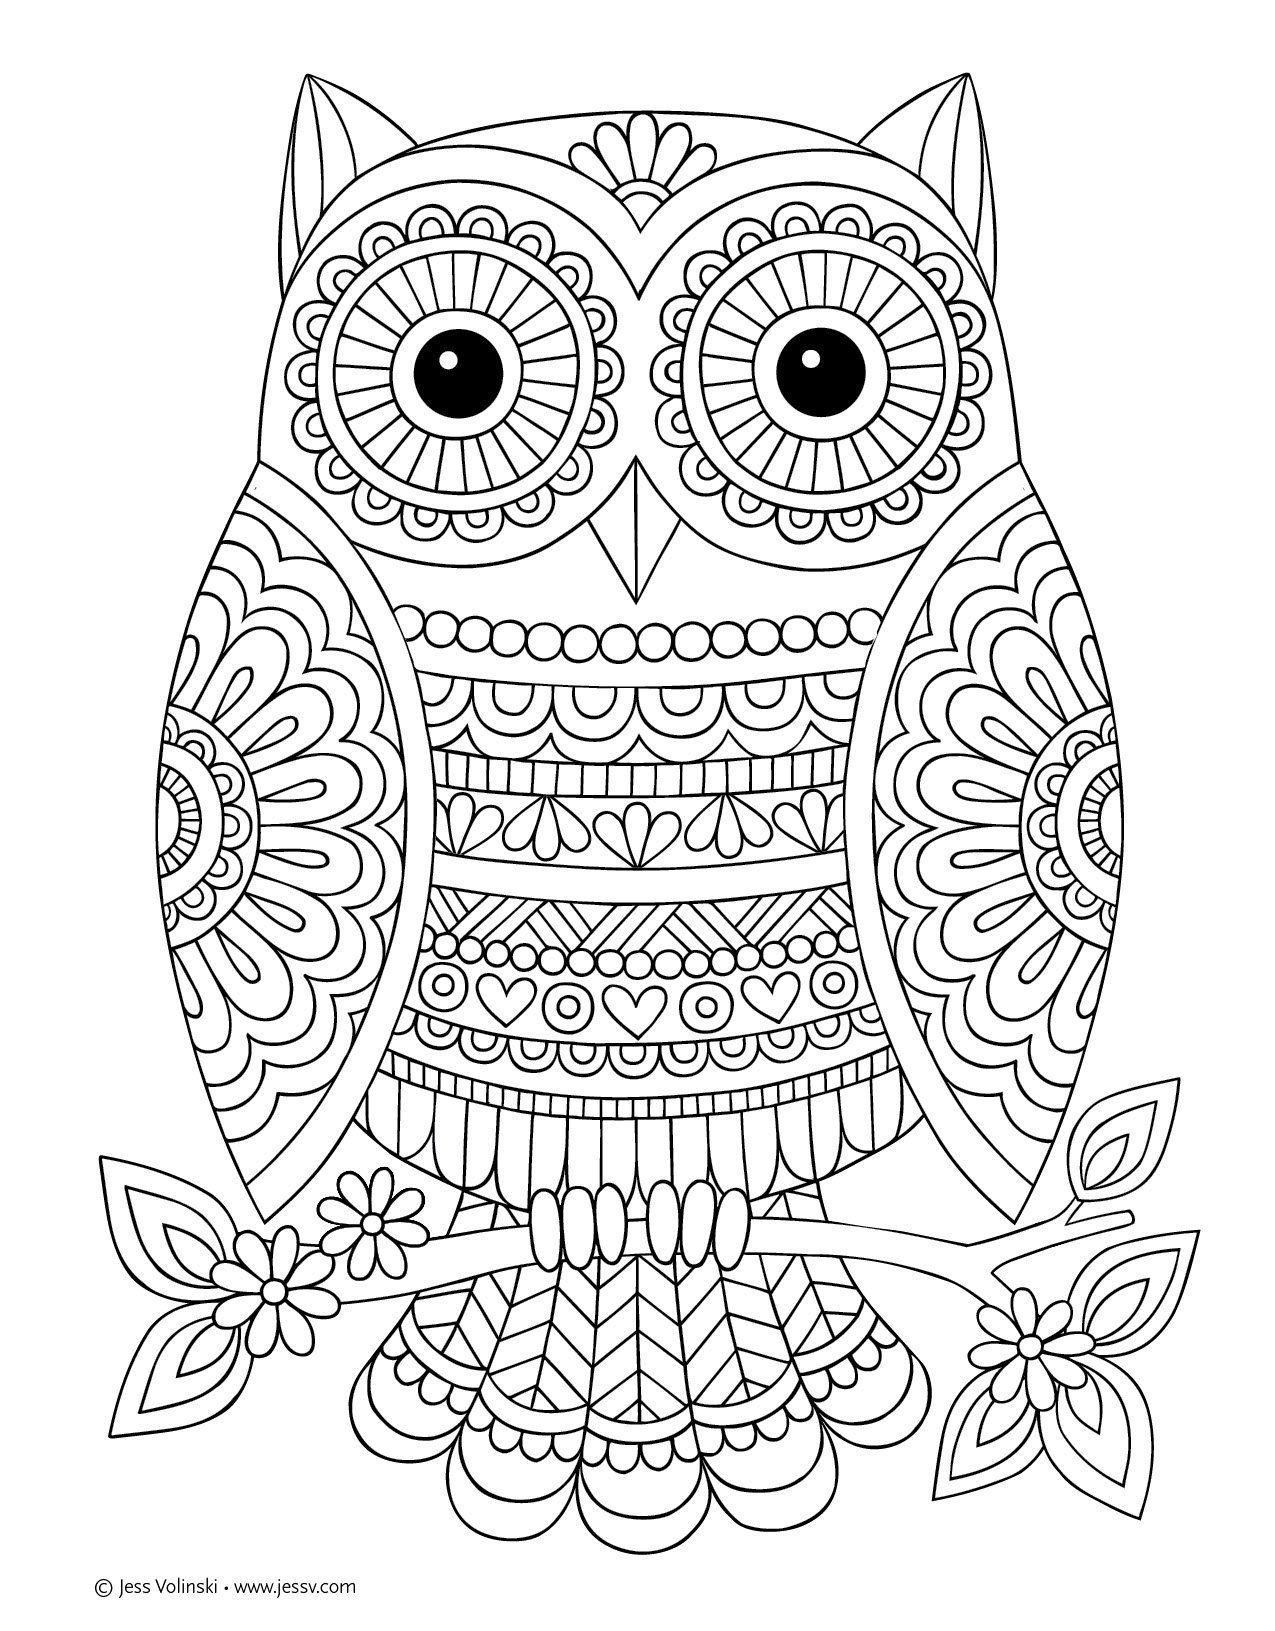 Robot Check Owl Coloring Pages Mandala Coloring Pages Mandala Coloring